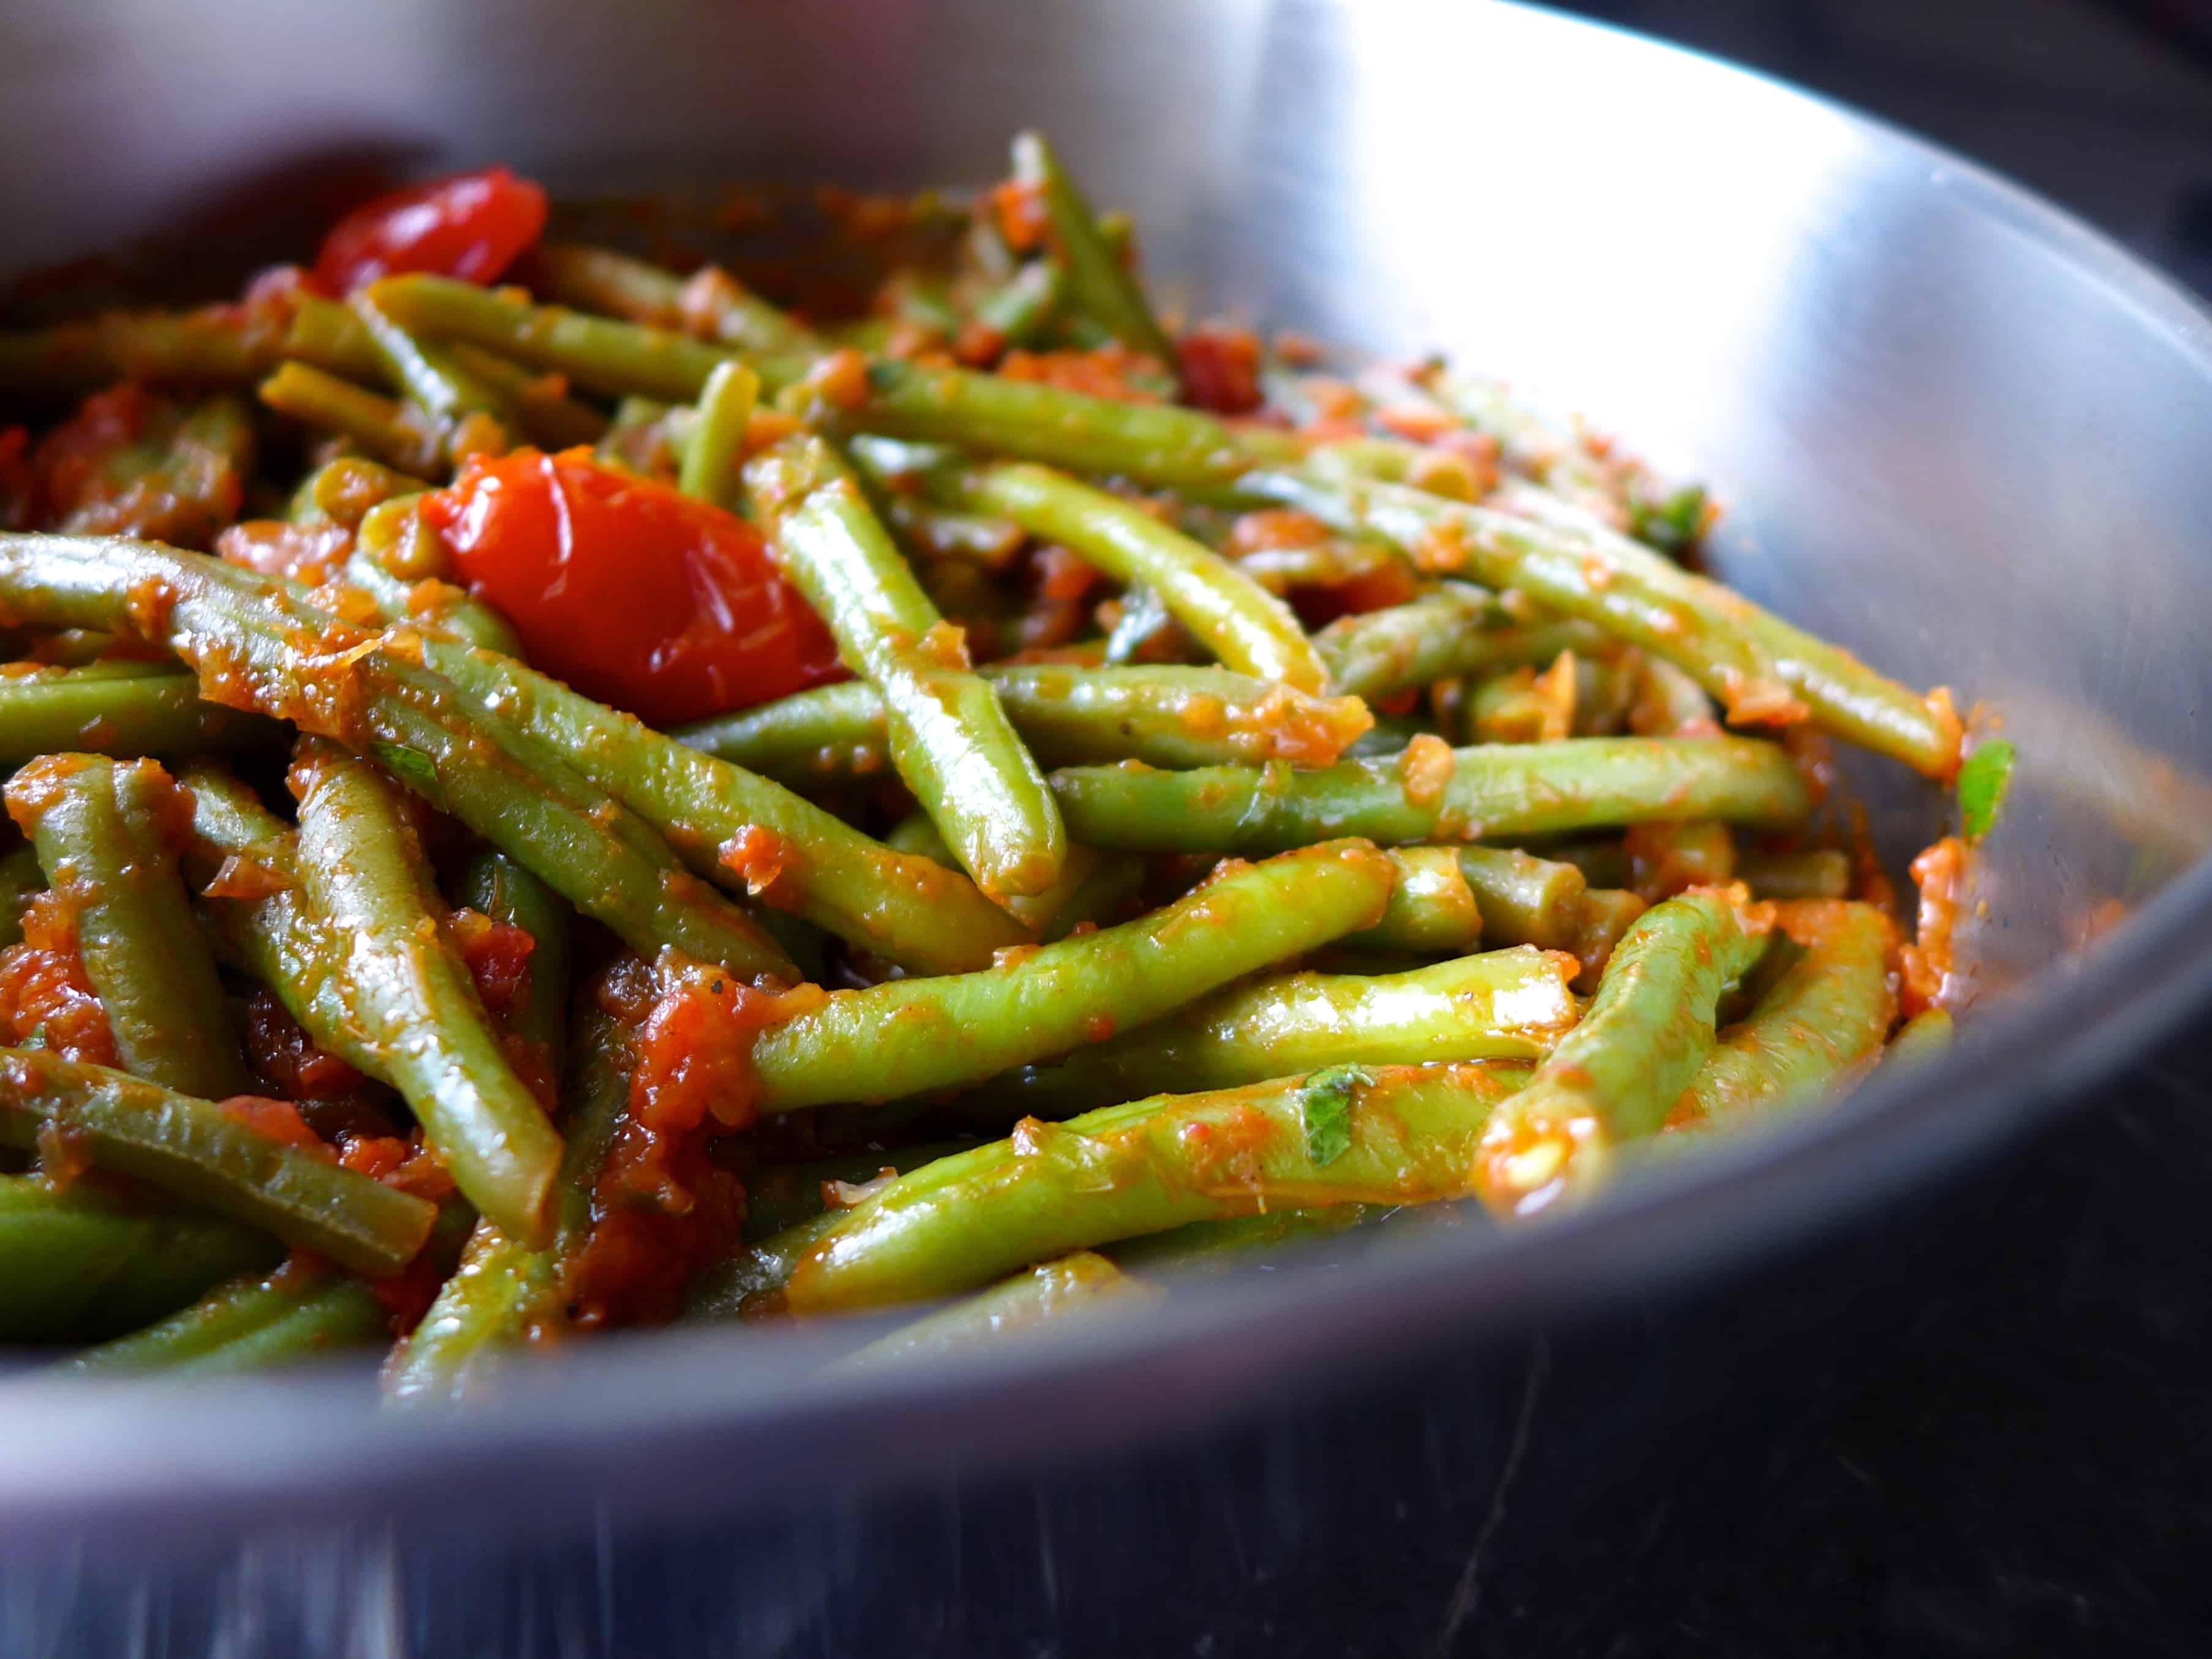 ... Greek green beans recipe (Fasolakia giaxni)-prep1 - My Greek Dish